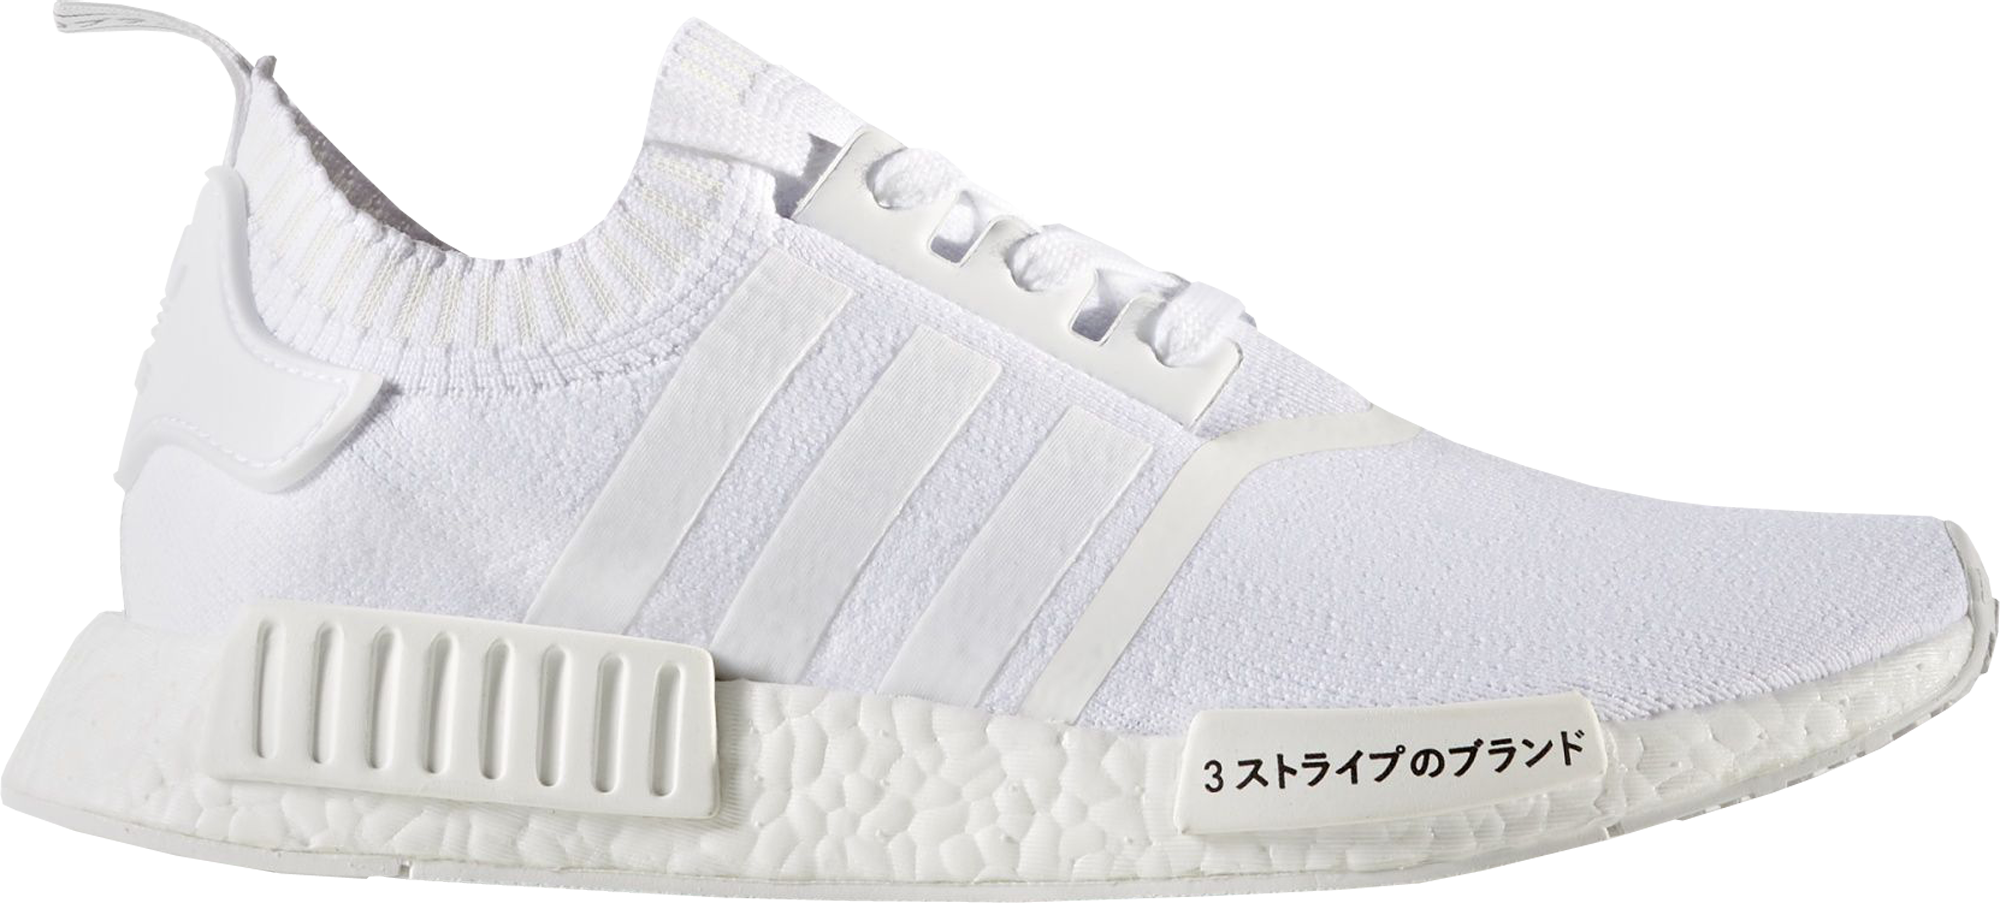 half off 54901 e2248 Three Quarter view of Men u0027s adidas NMD R1 STLT Primeknit Casual Shoes  in Footwear White